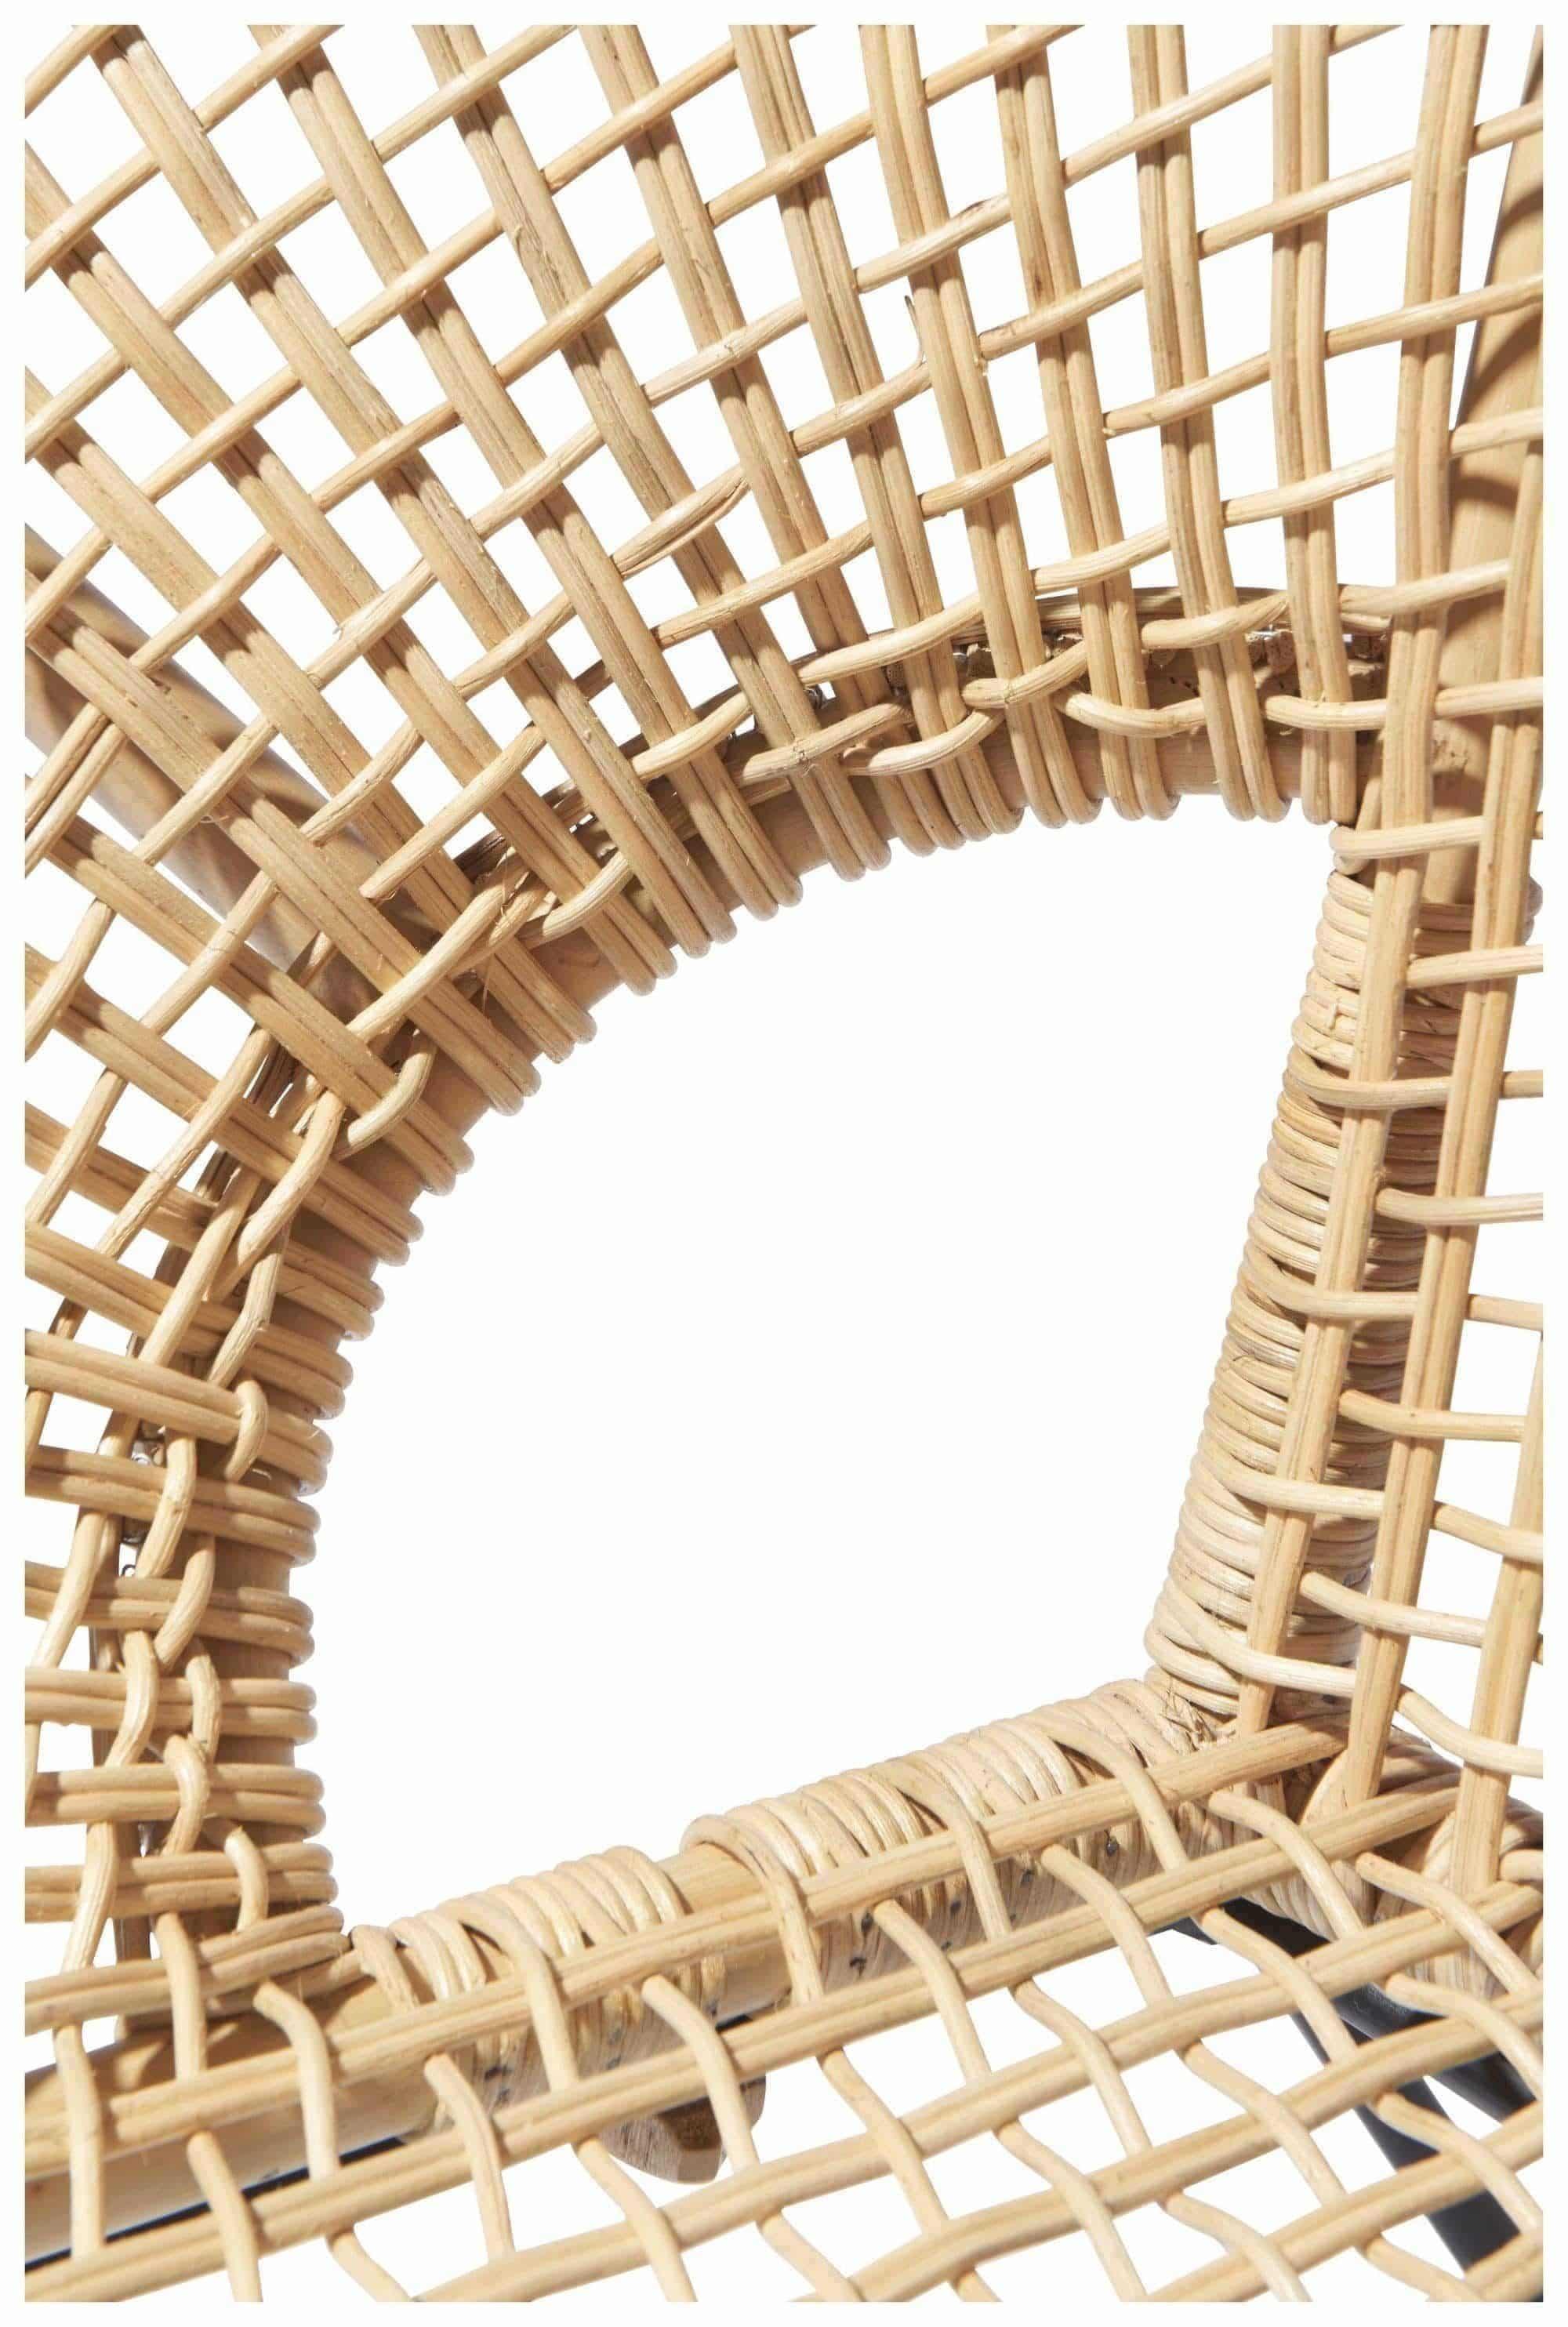 Silla Ubud fair furniture detalle 2